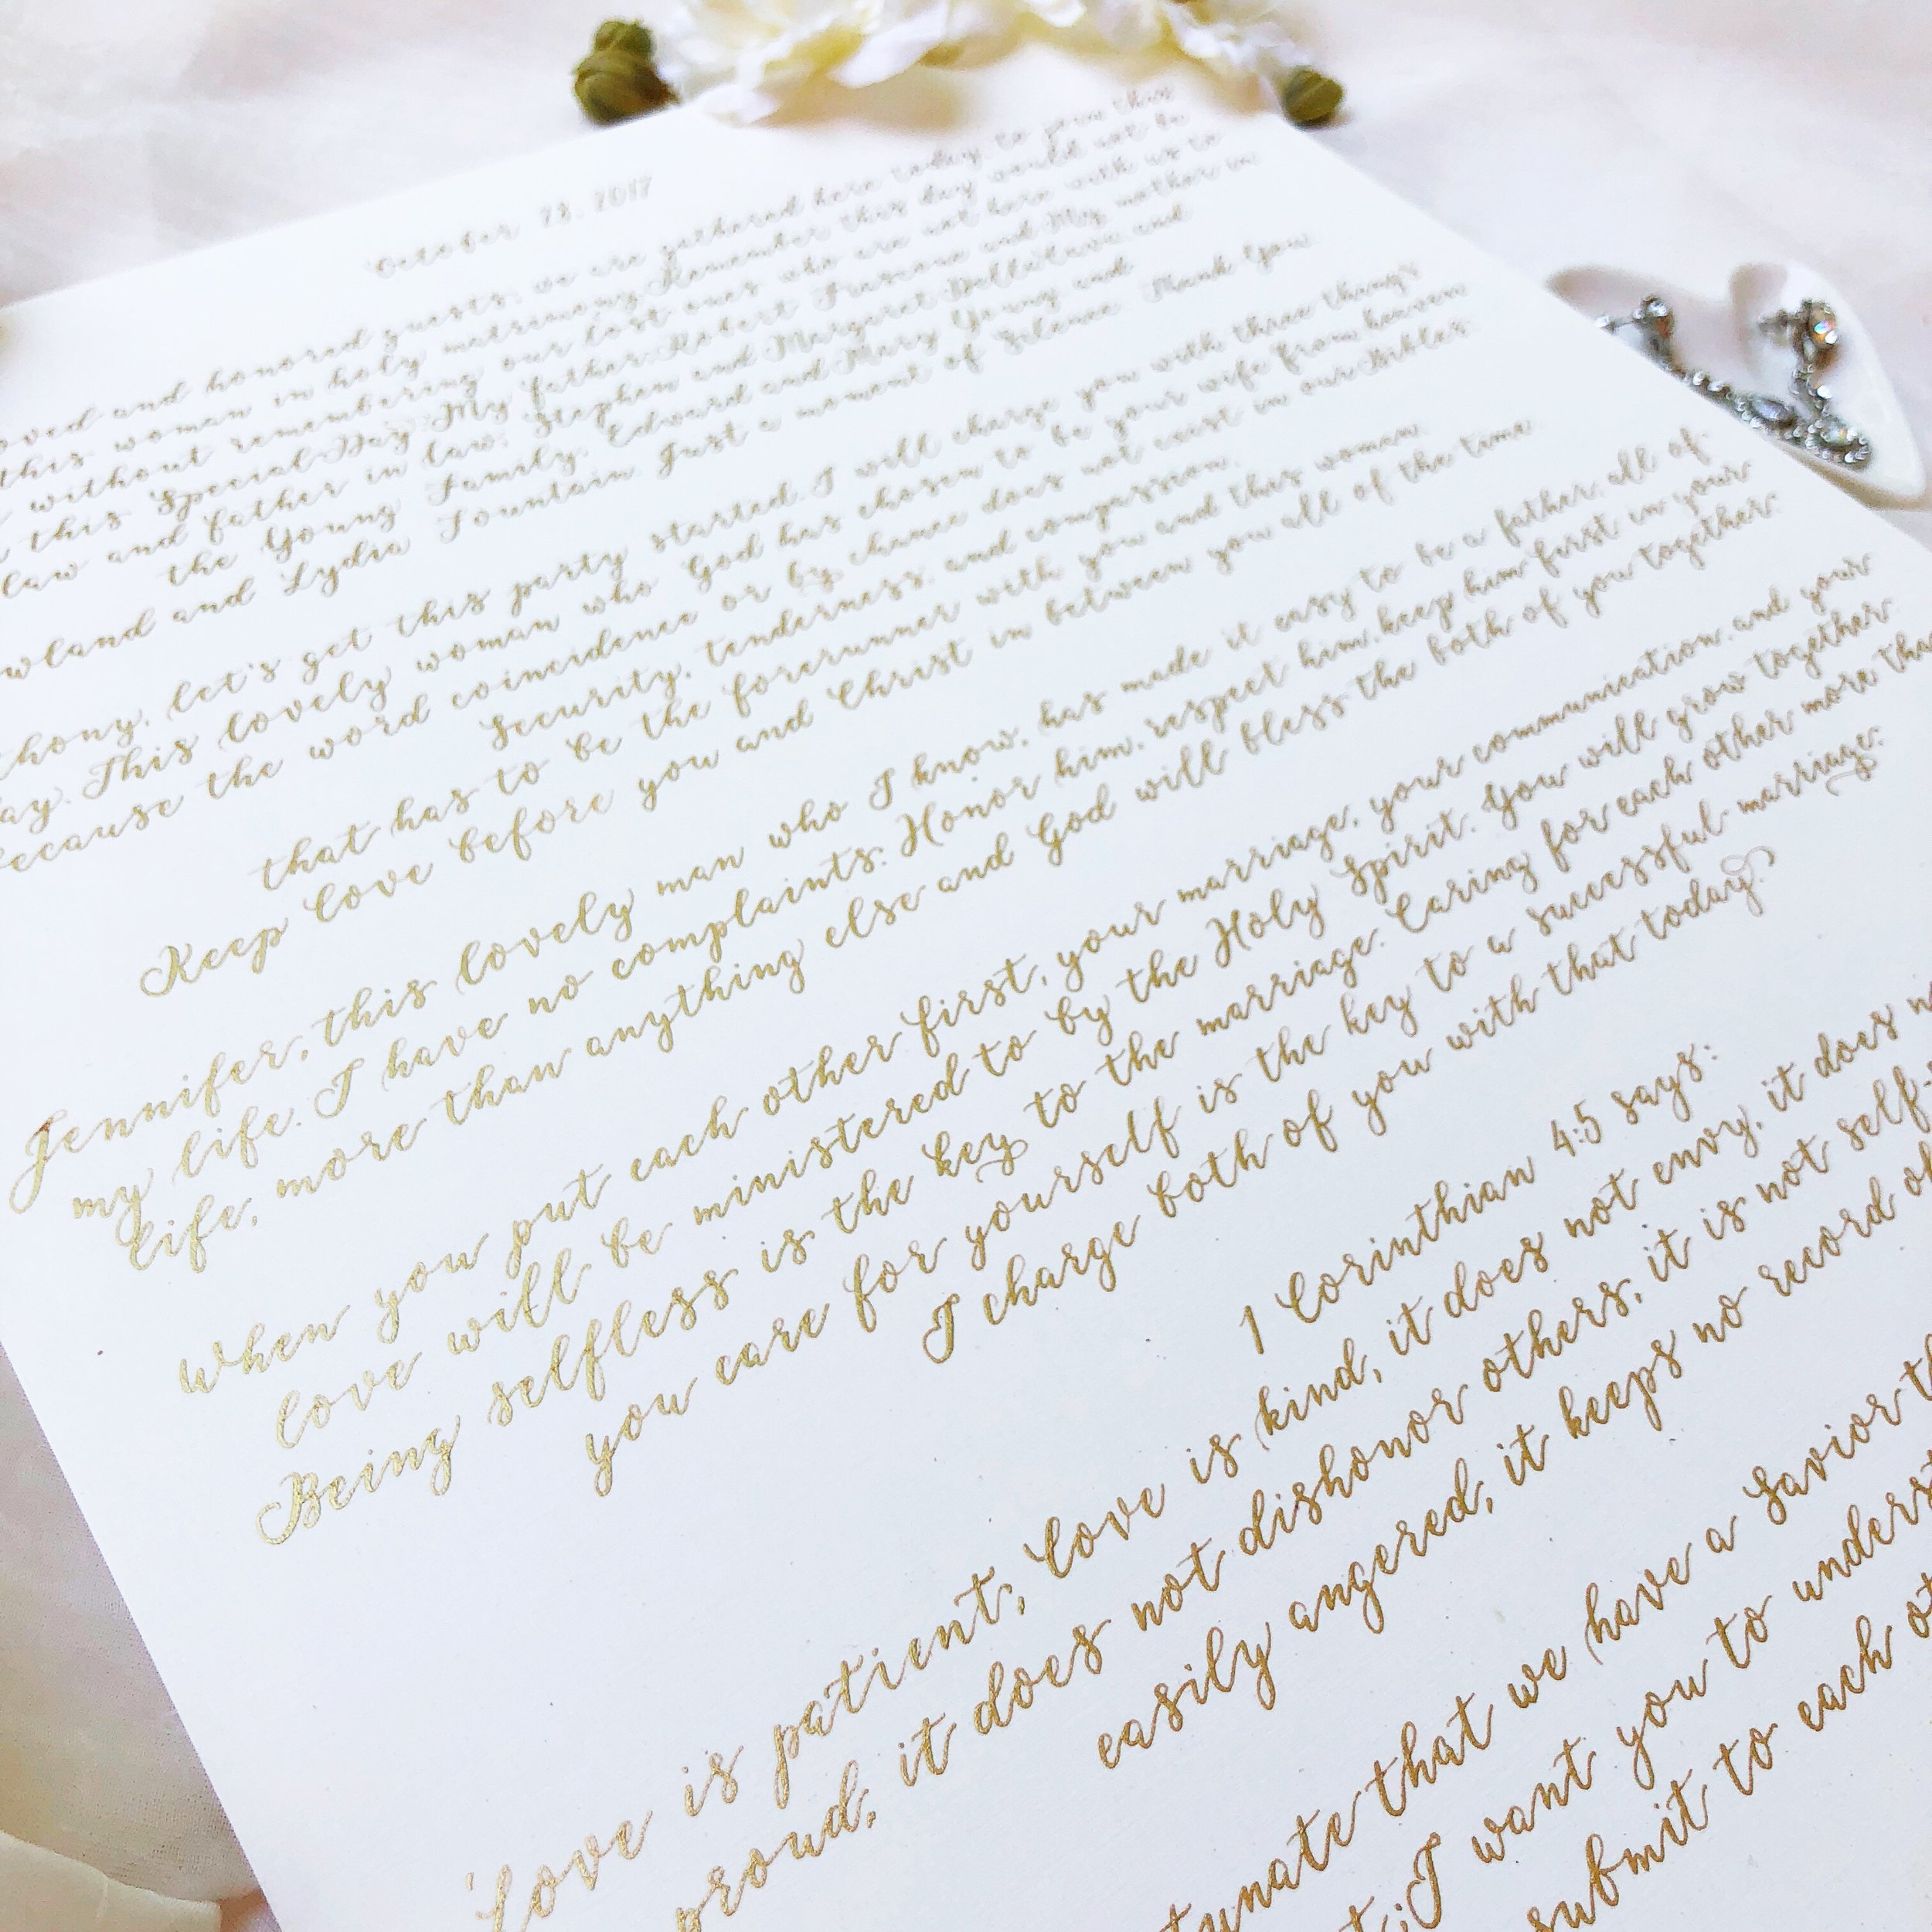 Central PA, York PA, JesSmith Designs, custom, wedding, invitations, bridal, Harrisburg, hanover, calligraphy, baltimore, wedding invitations, lancaster, gettysburg, 06-12 18.41.33.jpg